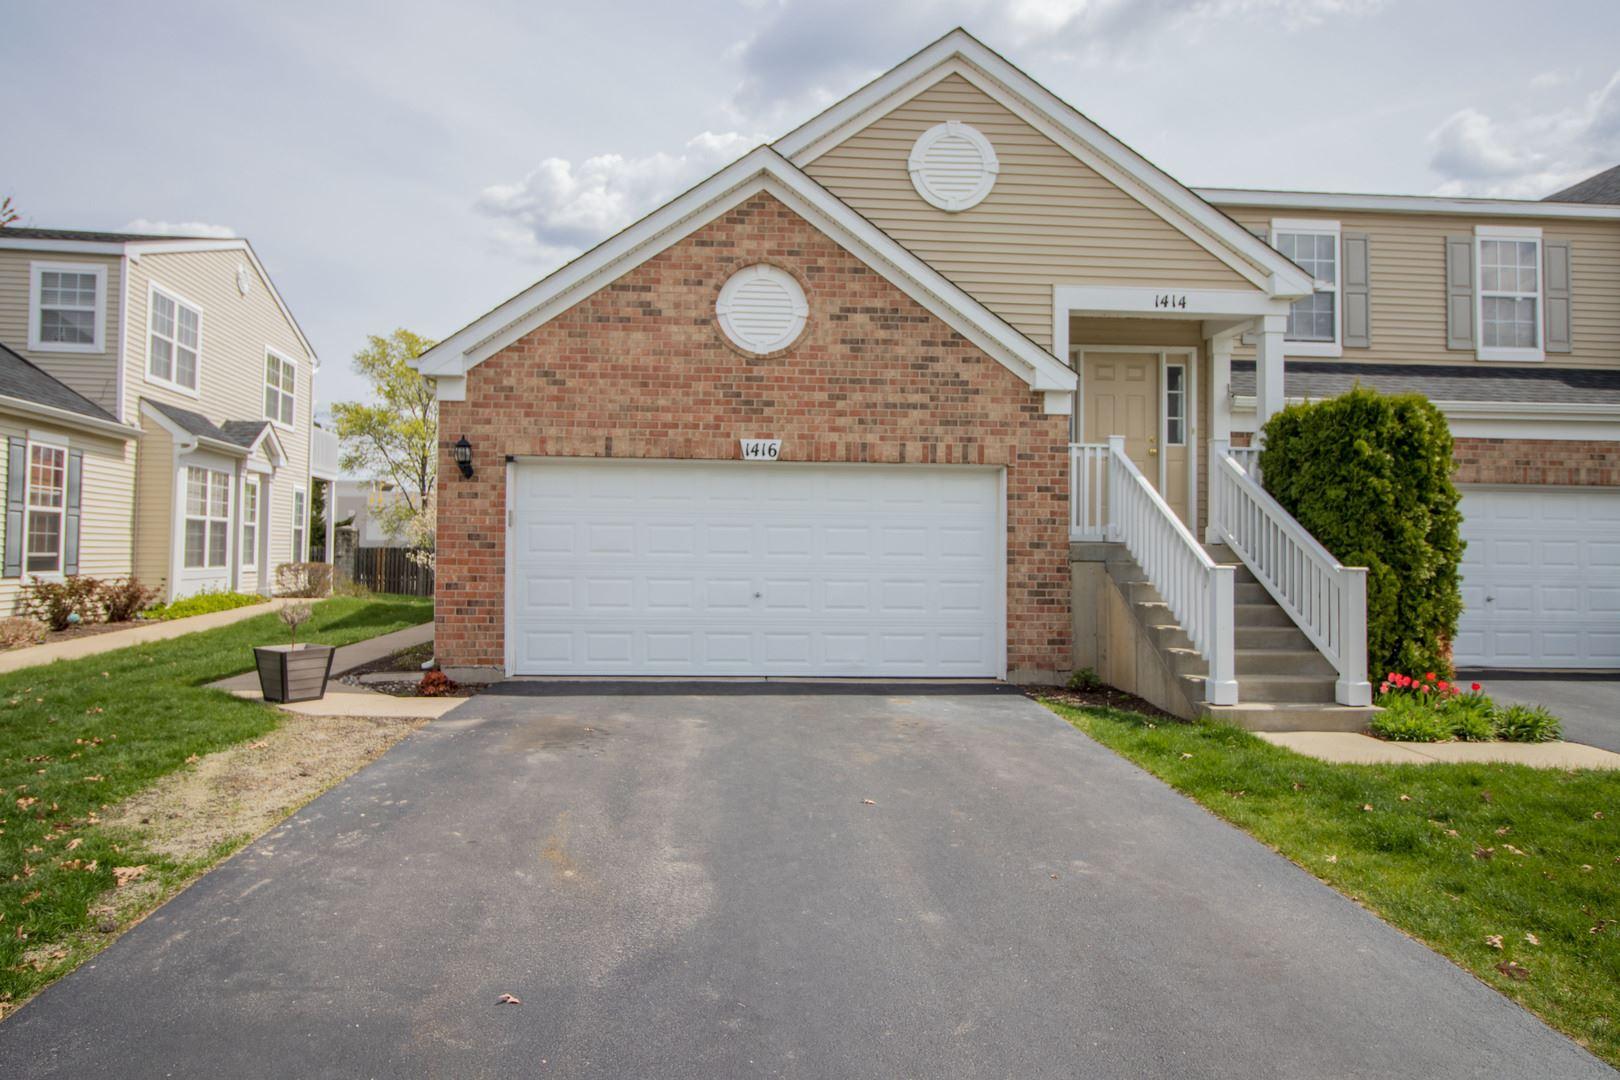 Photo of 1416 Westhampton Drive #1, Plainfield, IL 60586 (MLS # 11057971)